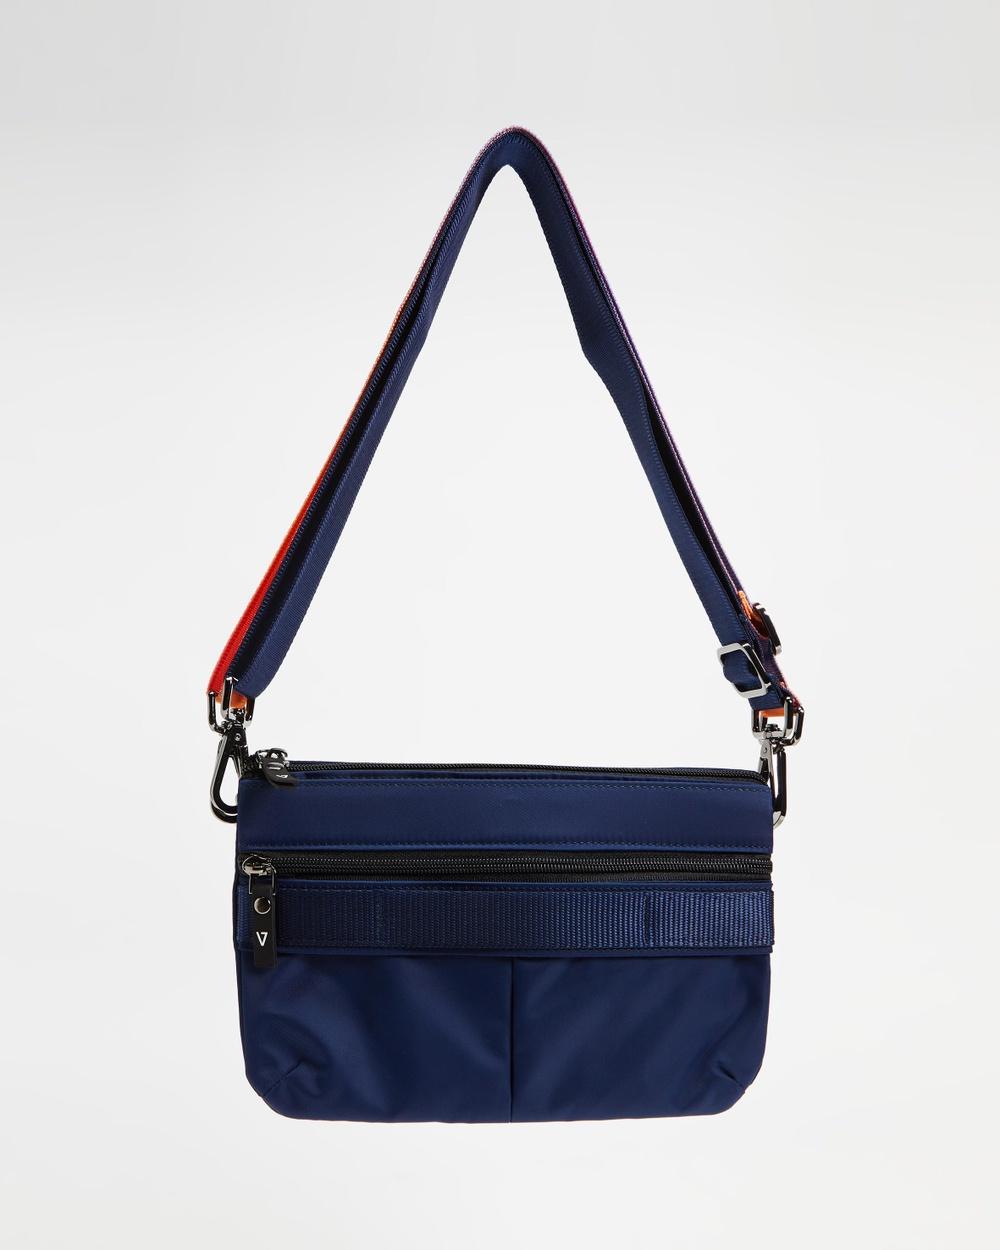 ANDI New York Andi Go Bag Outdoors Navy